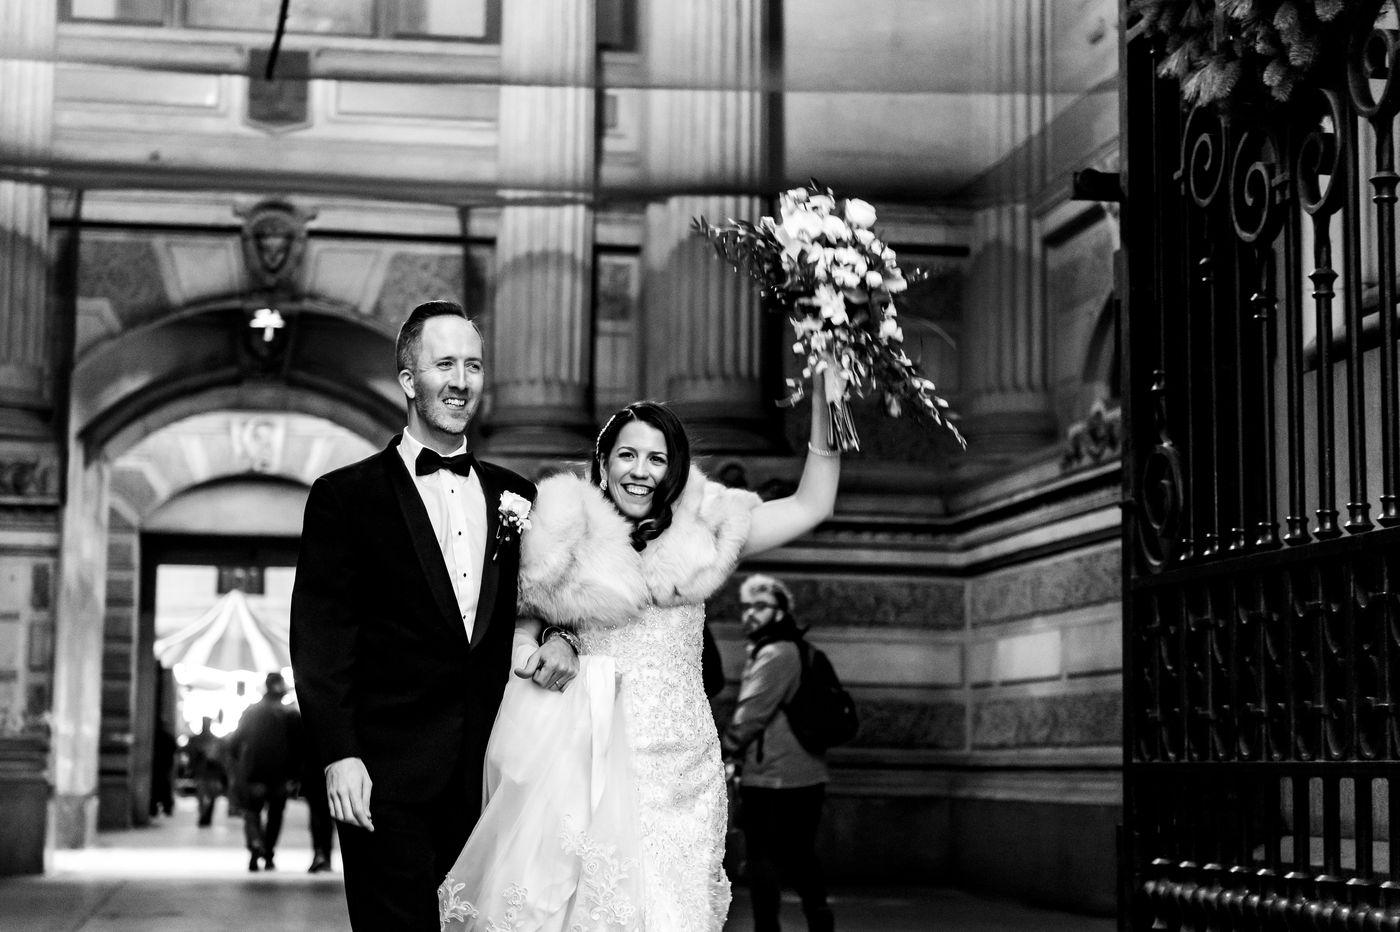 Philadelphia weddings: Alexandra Meis and Nicholas Larson